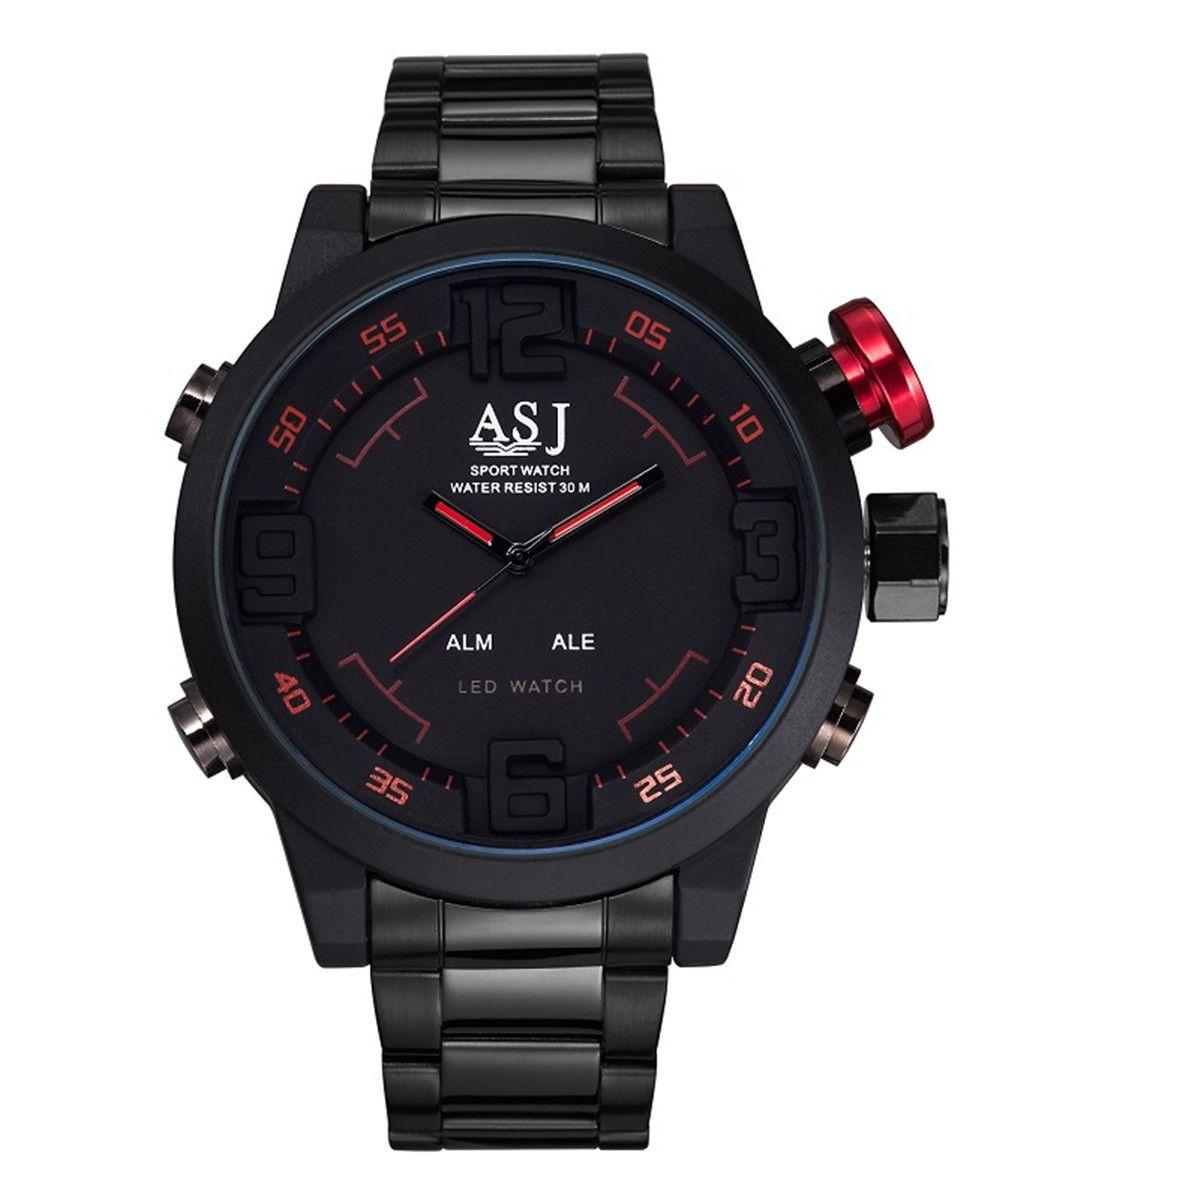 a626f1e0b63 2016 Original Brand ASJ Watch Men Black Steel Band Digital Watch Sports  Wristwatch LED Quartz Military